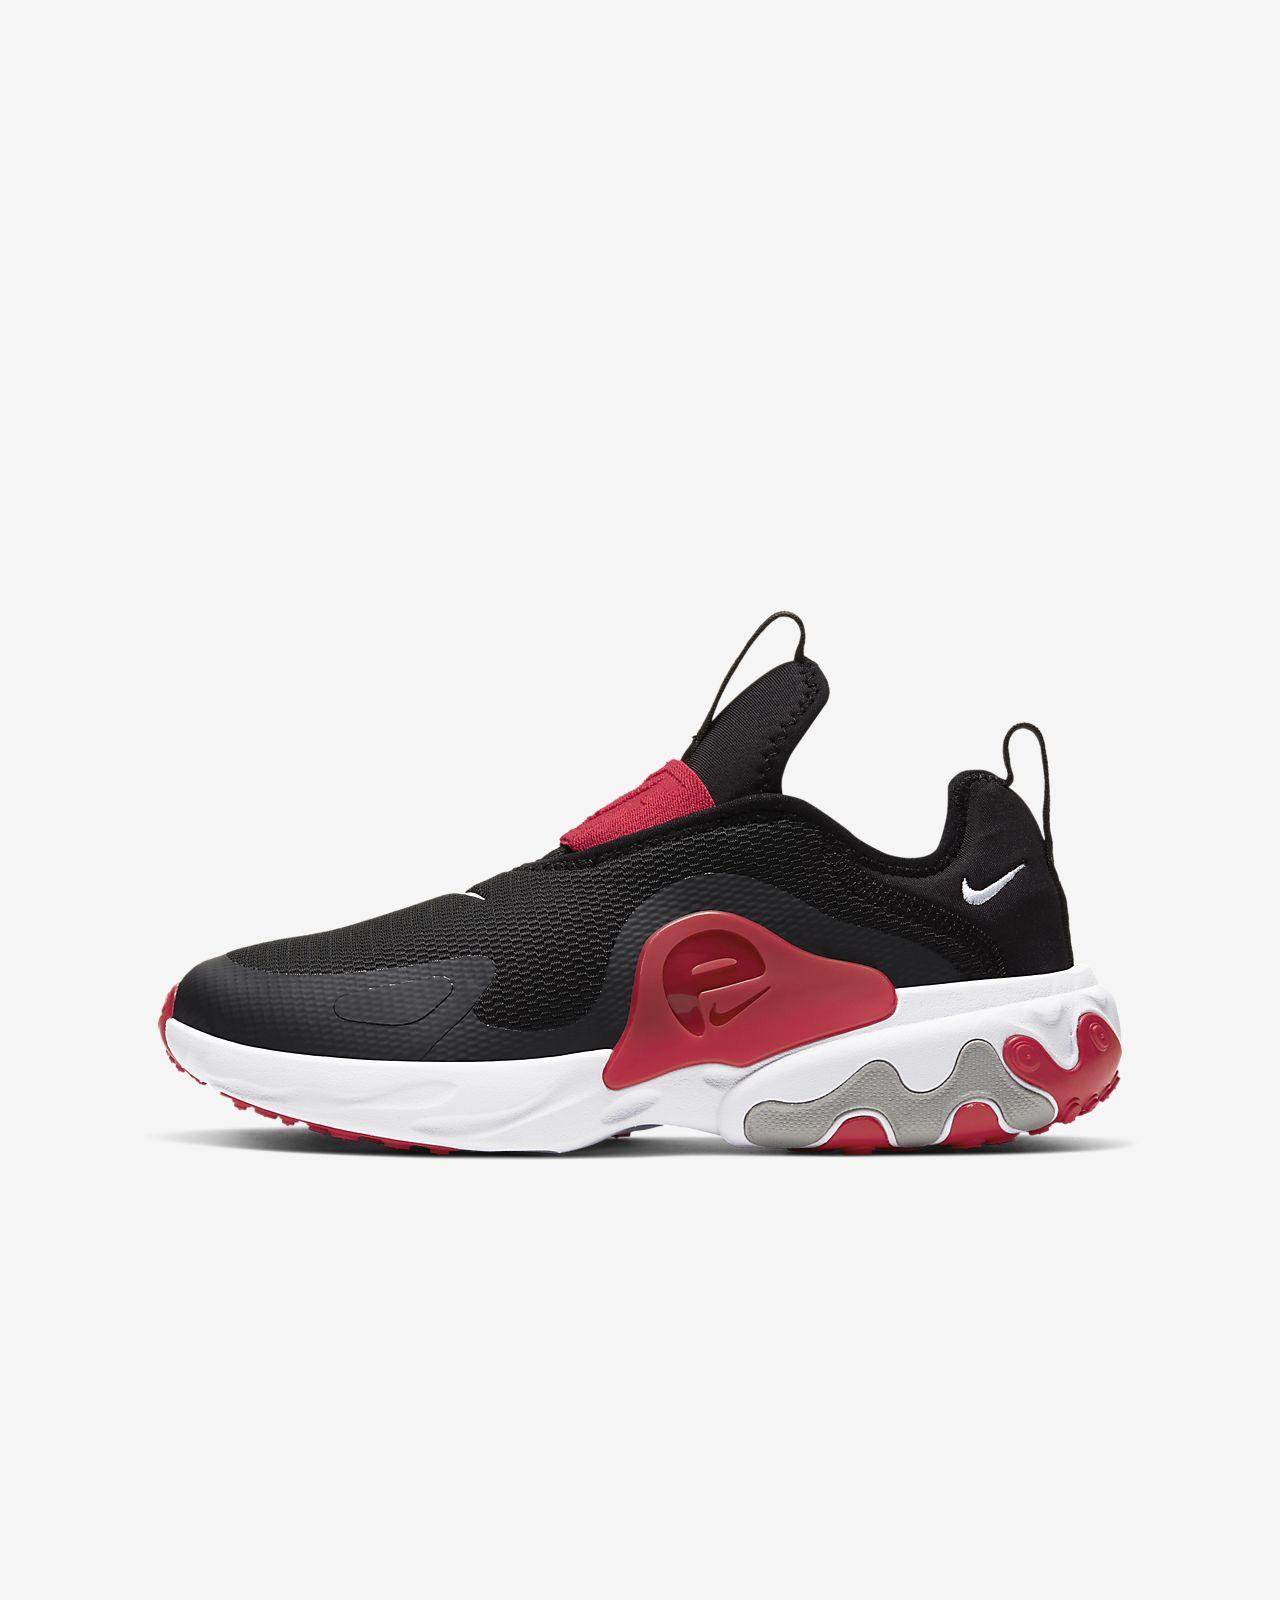 Nike React Presto Extreme (GS) 大童运动童鞋